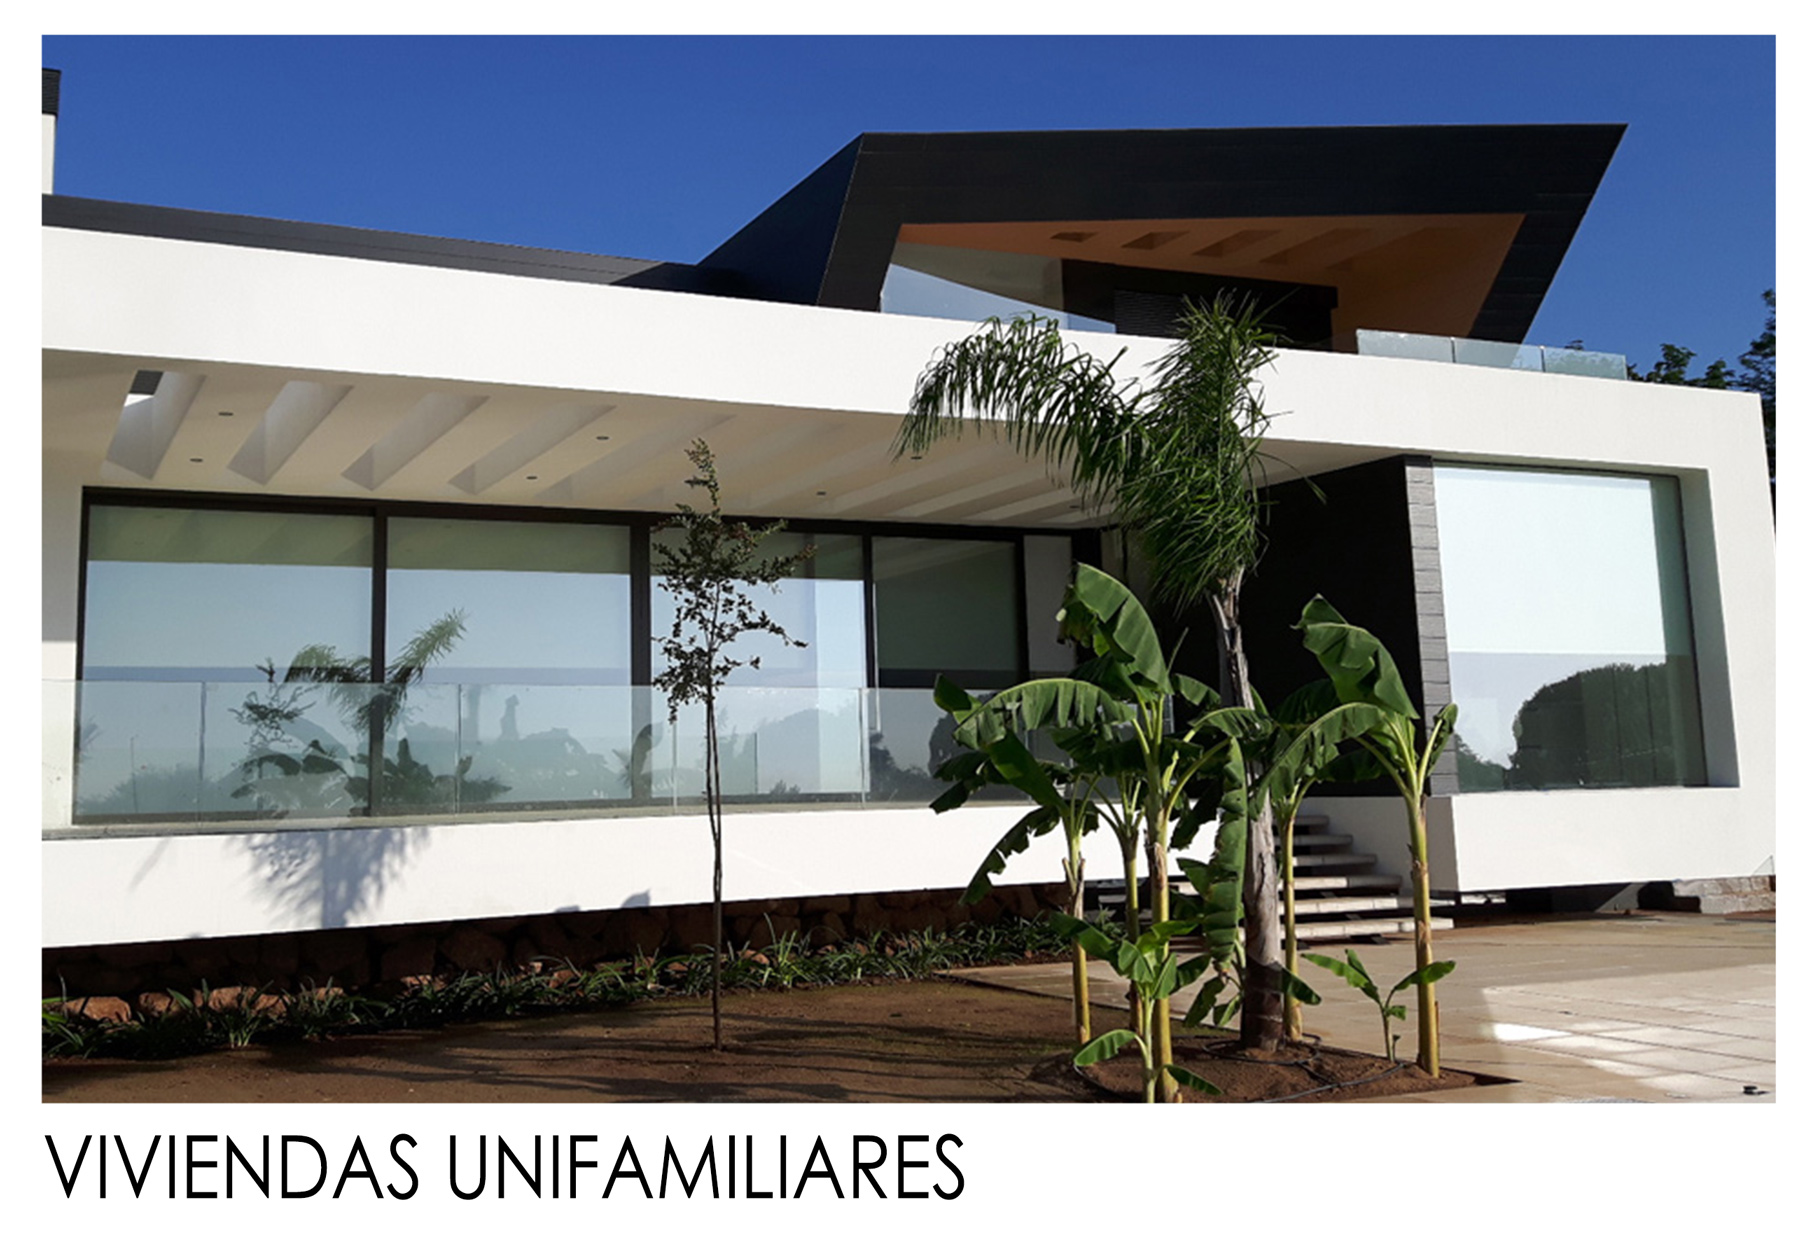 UNIFAMILIARES.jpg